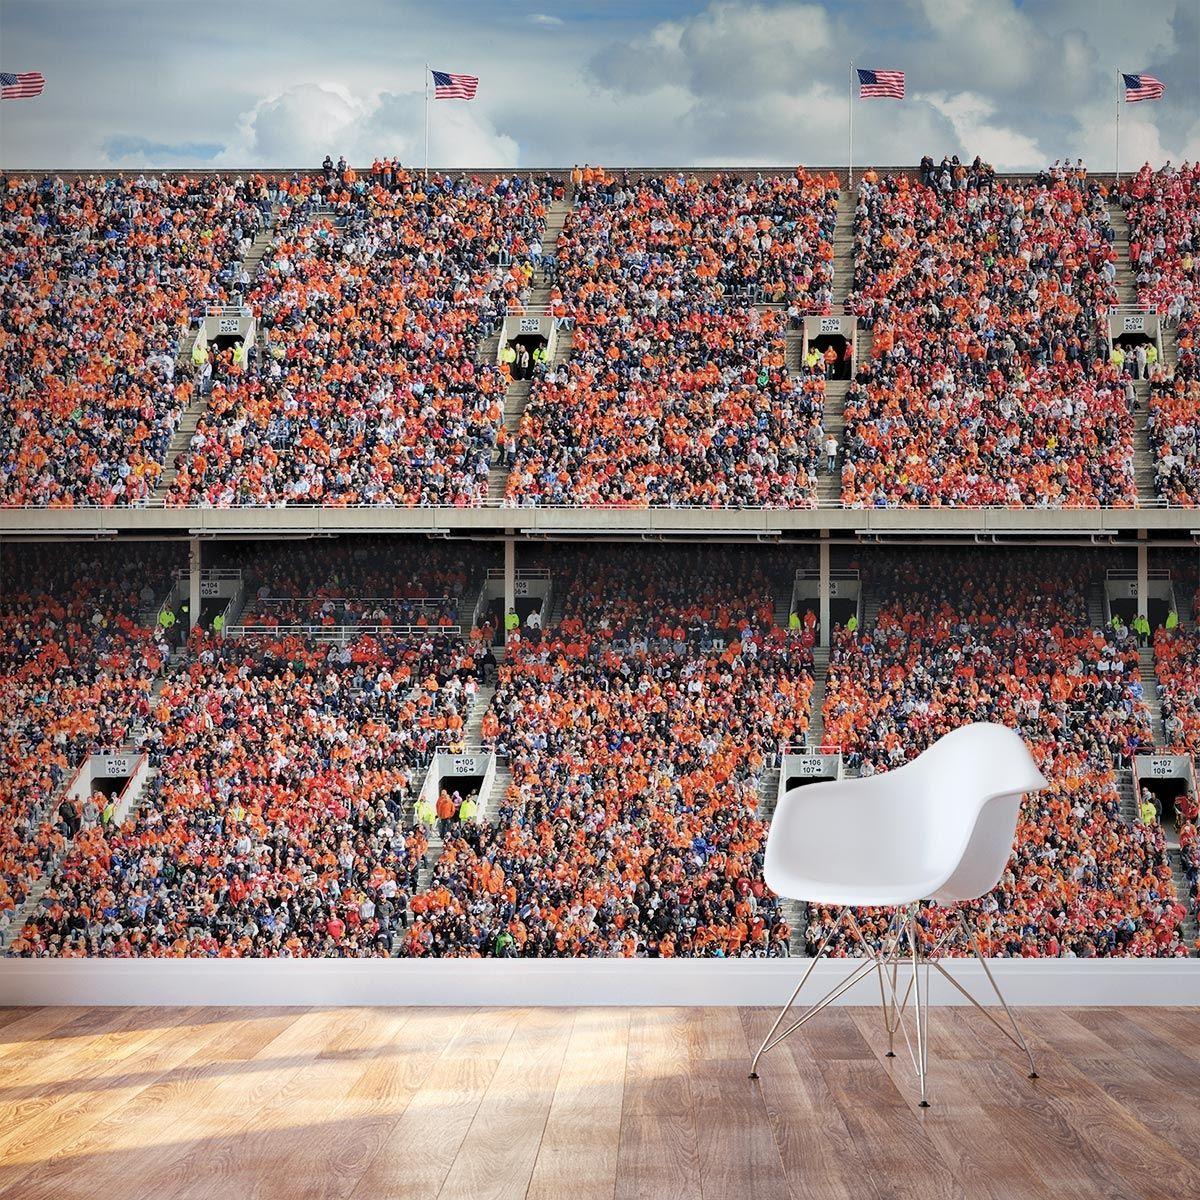 Sports Crowd Wall Mural Wall Murals Wallpaper Bedroom Mural